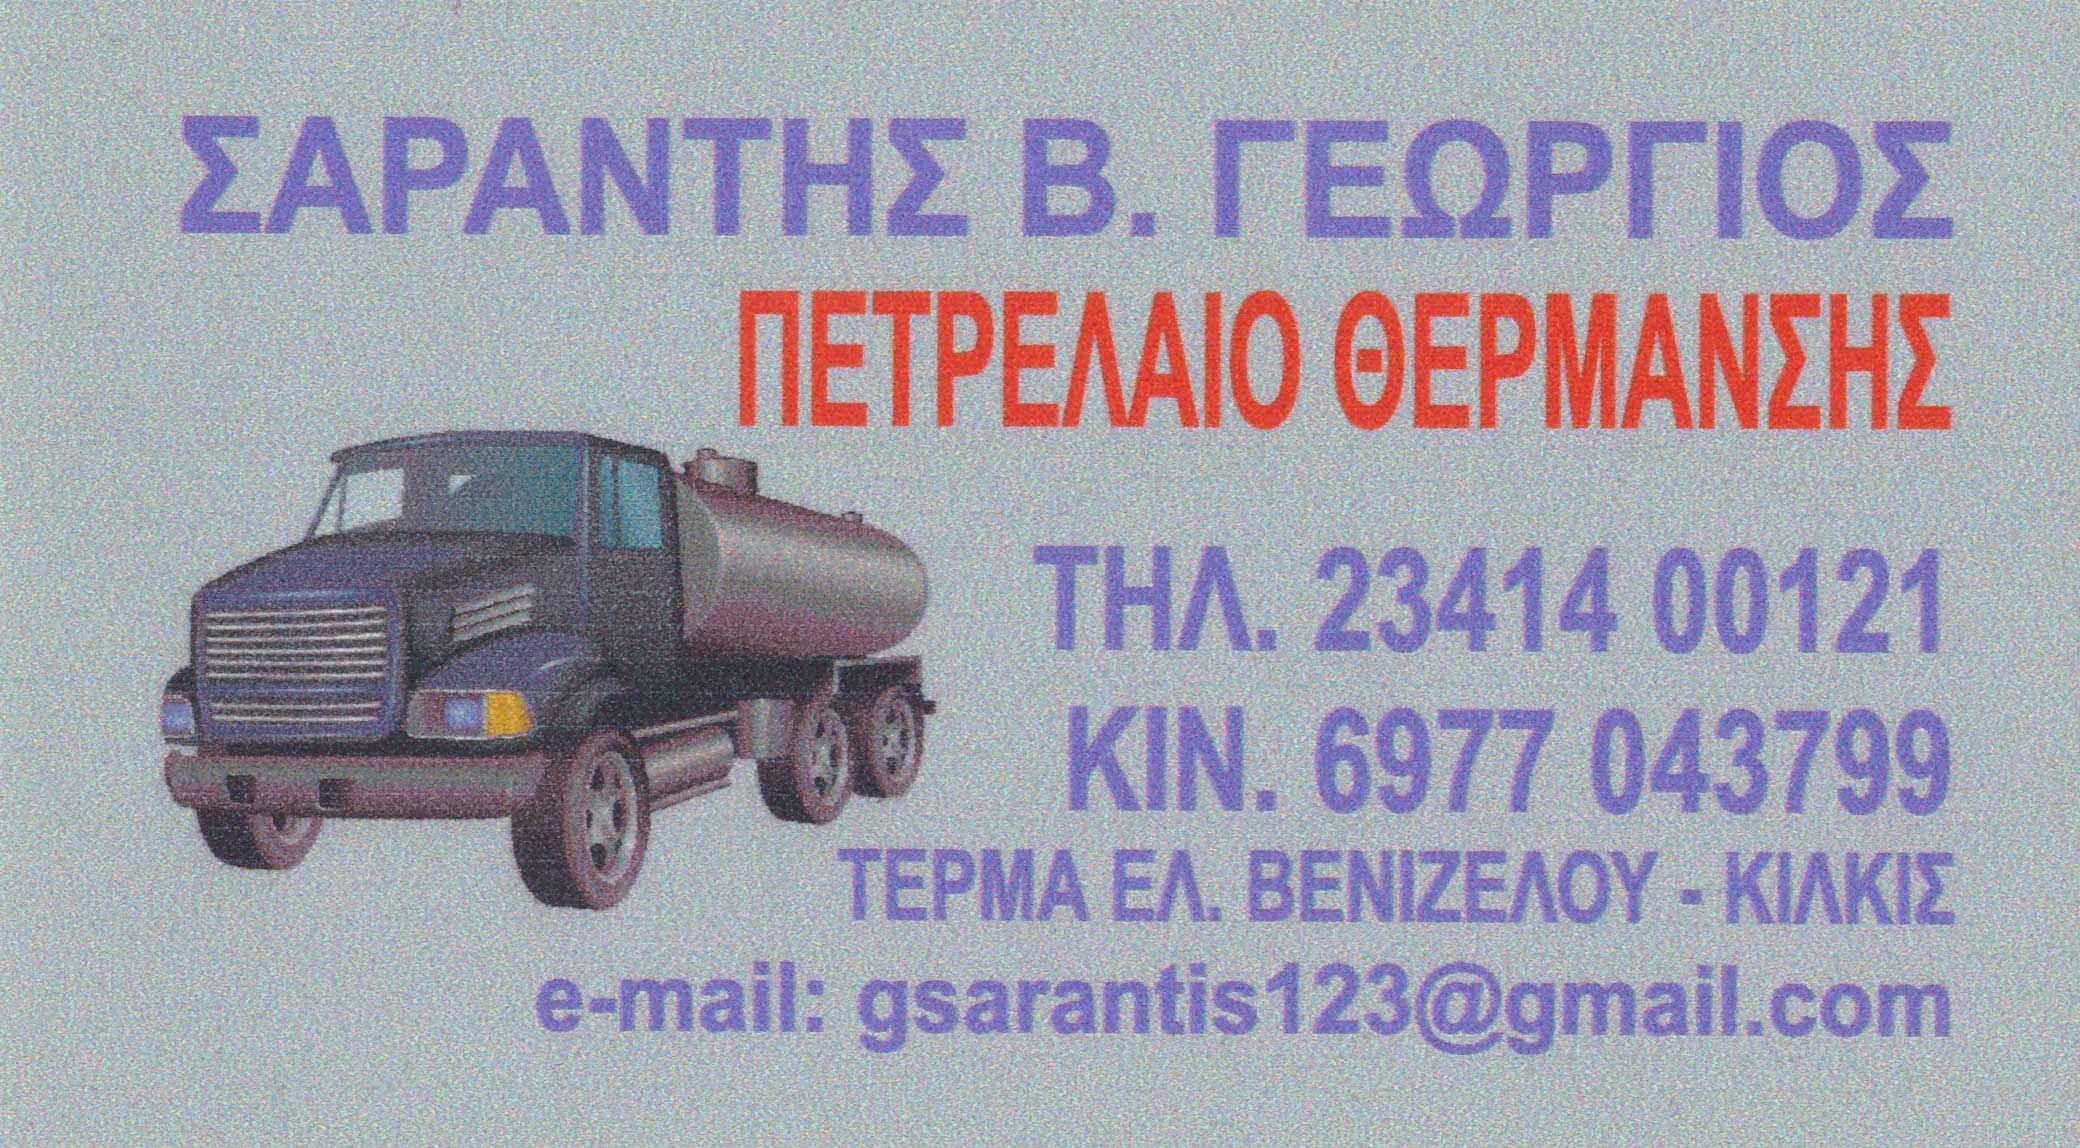 bcb277b75b0c Γενικές Υπηρεσίες - ΟΔΗΓΟΣ ΚΙΛΚΙΣ